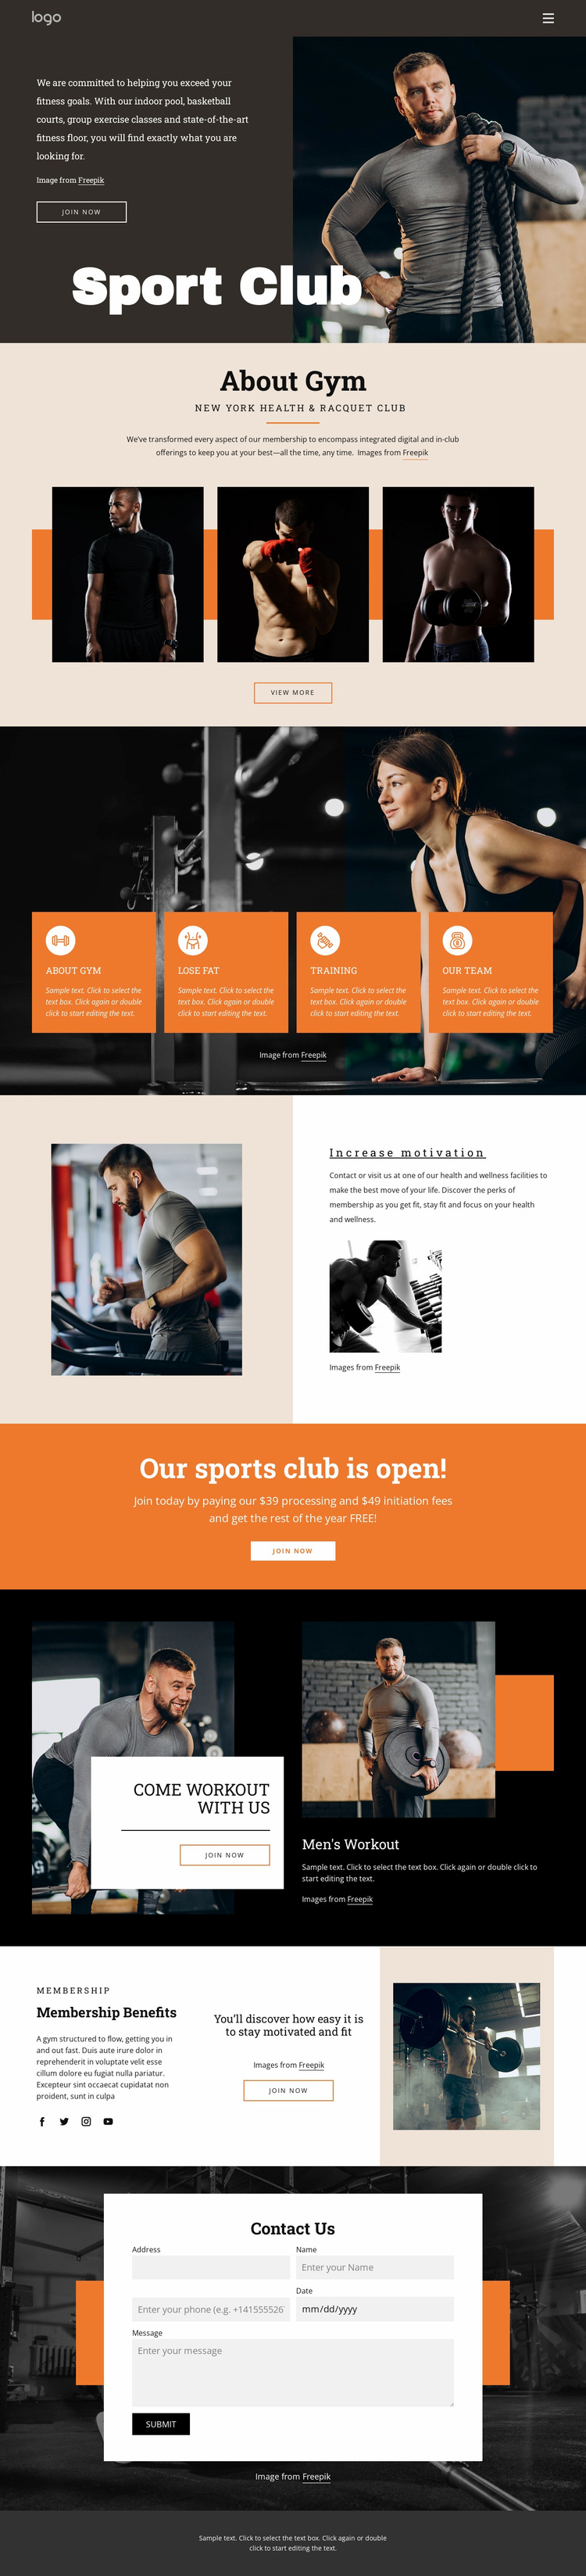 Convenient personal training programs Website Template